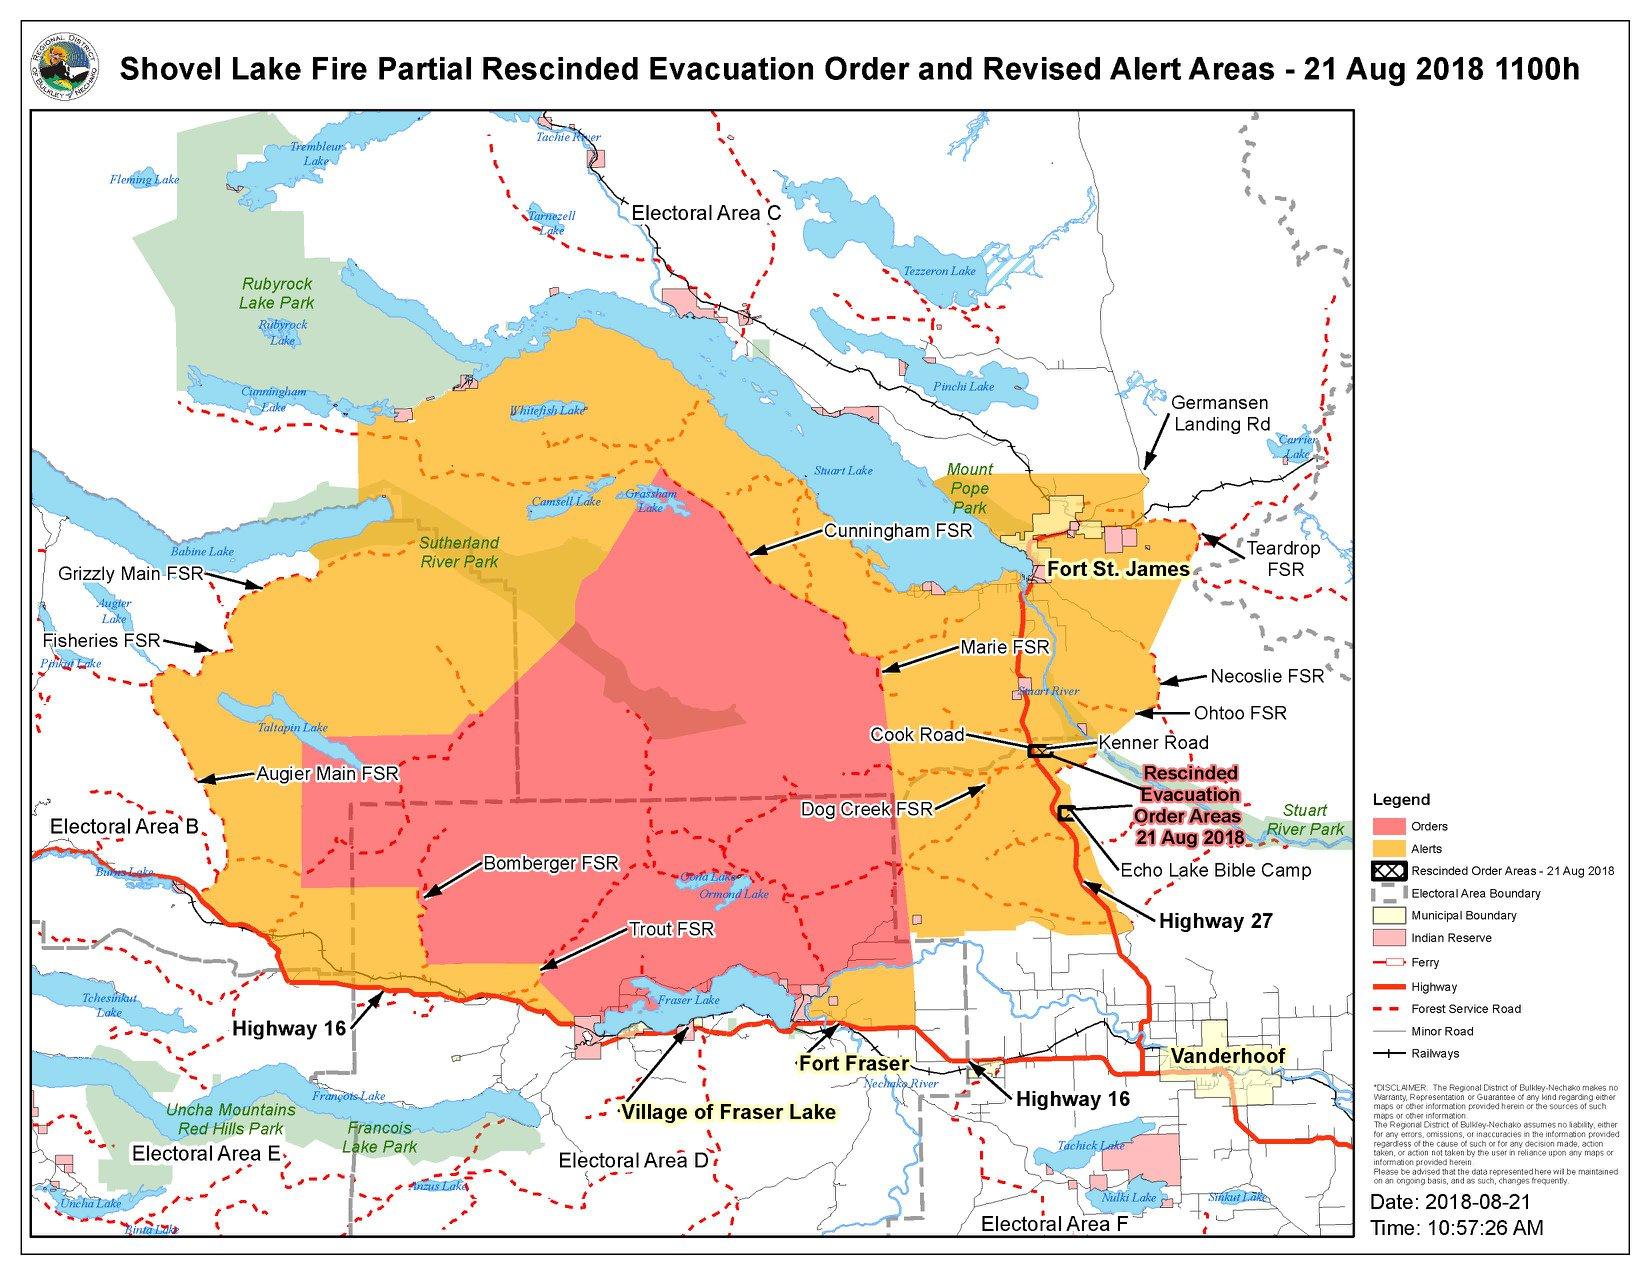 Rdbn Downgrades Evacuation Order For Dog Creek Echo Lake Bible Camp